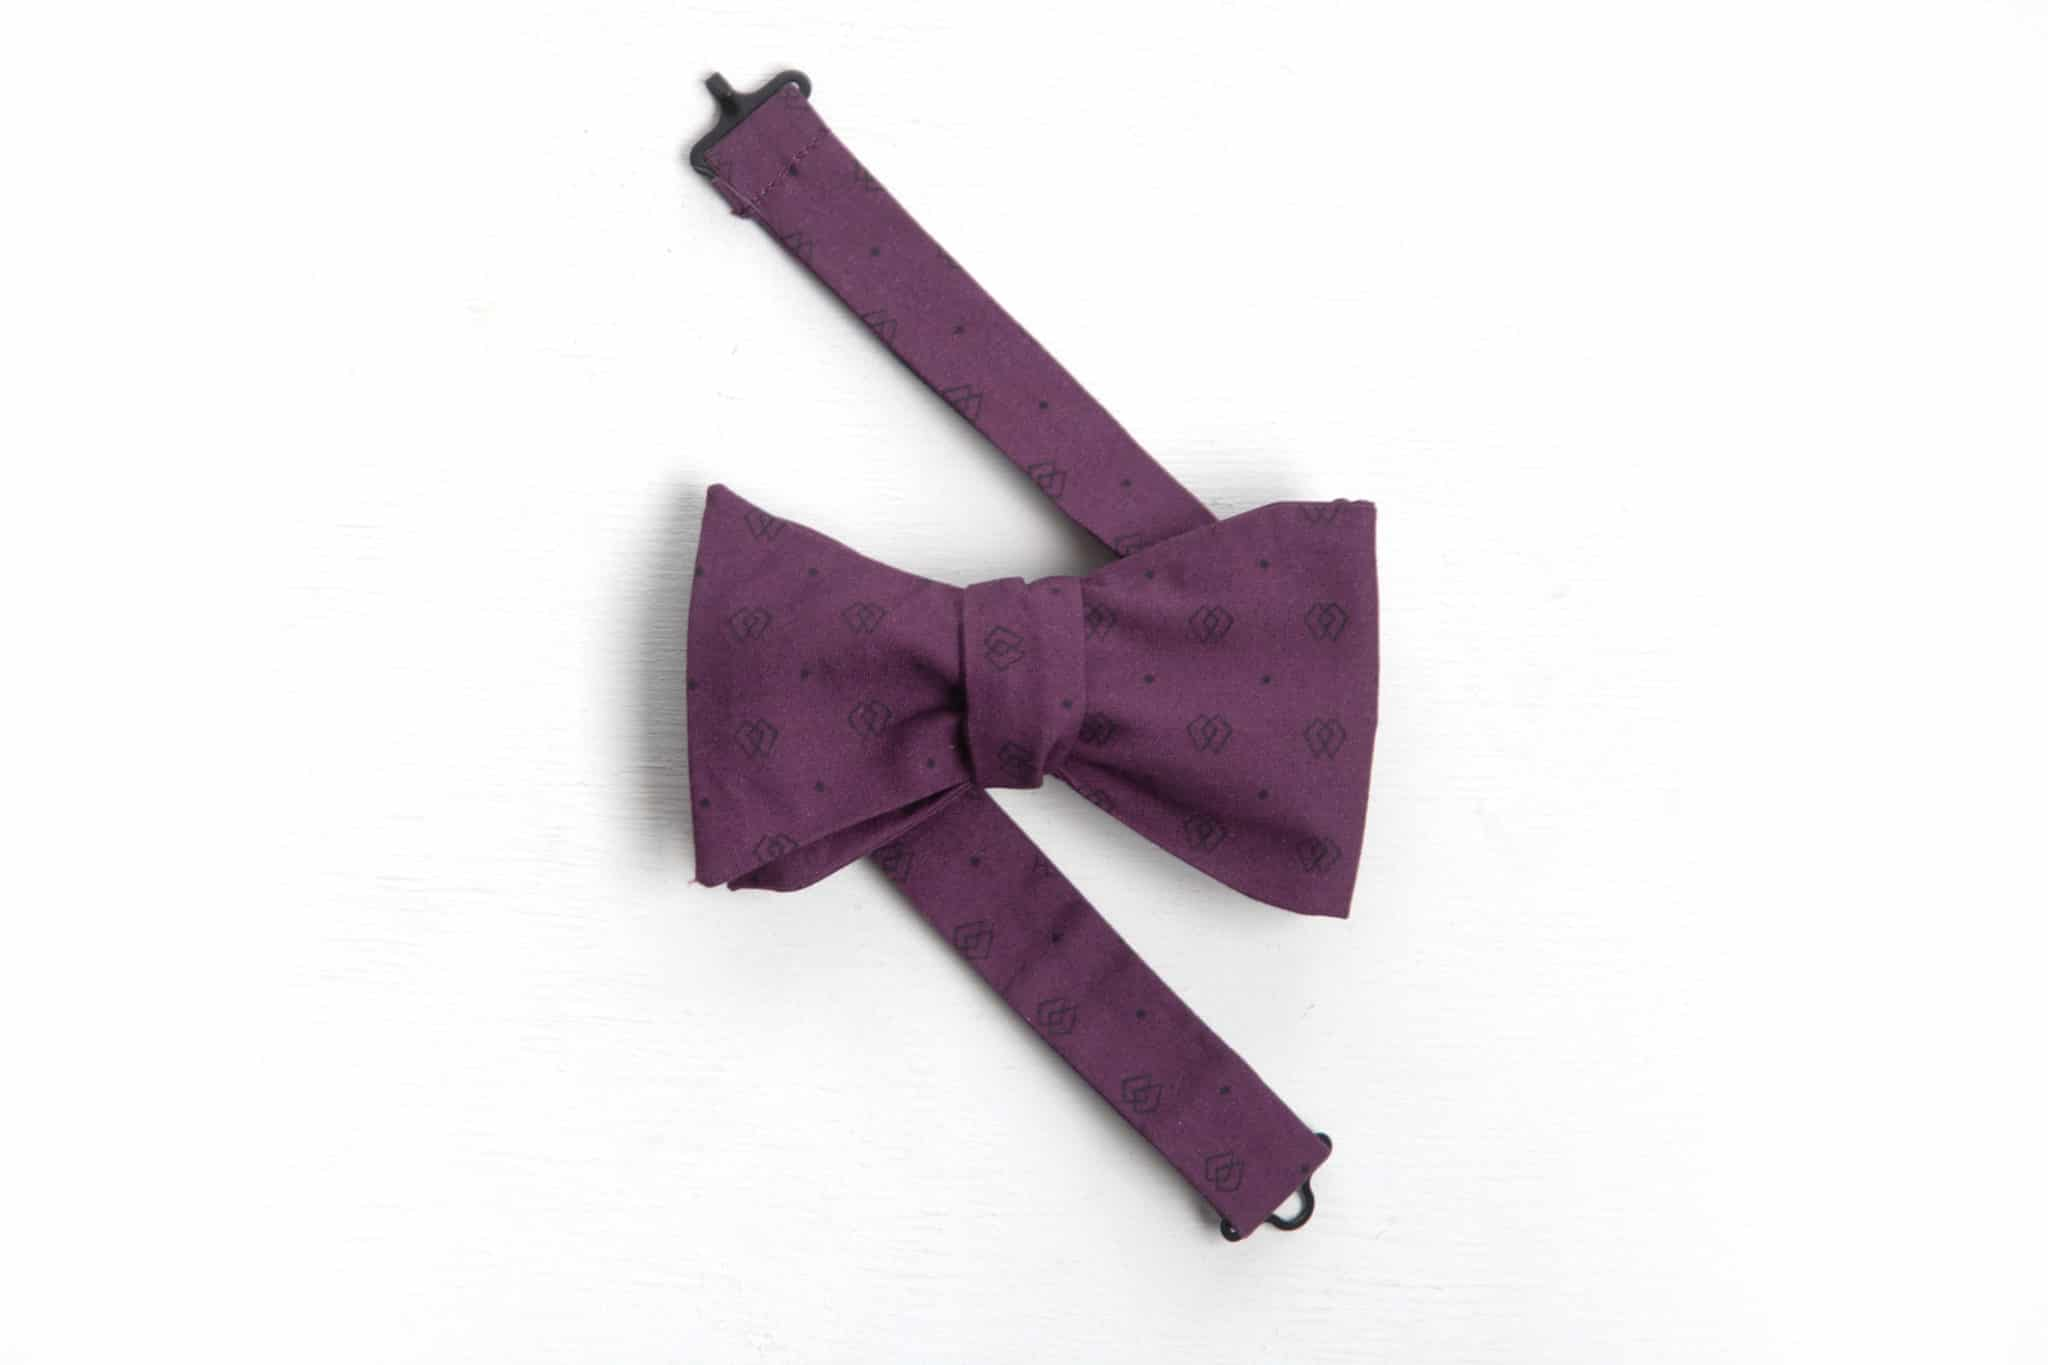 phpddf7li-noeud-papillon-homme-violet-et-noir-rue-mouffetard-rm-scaled